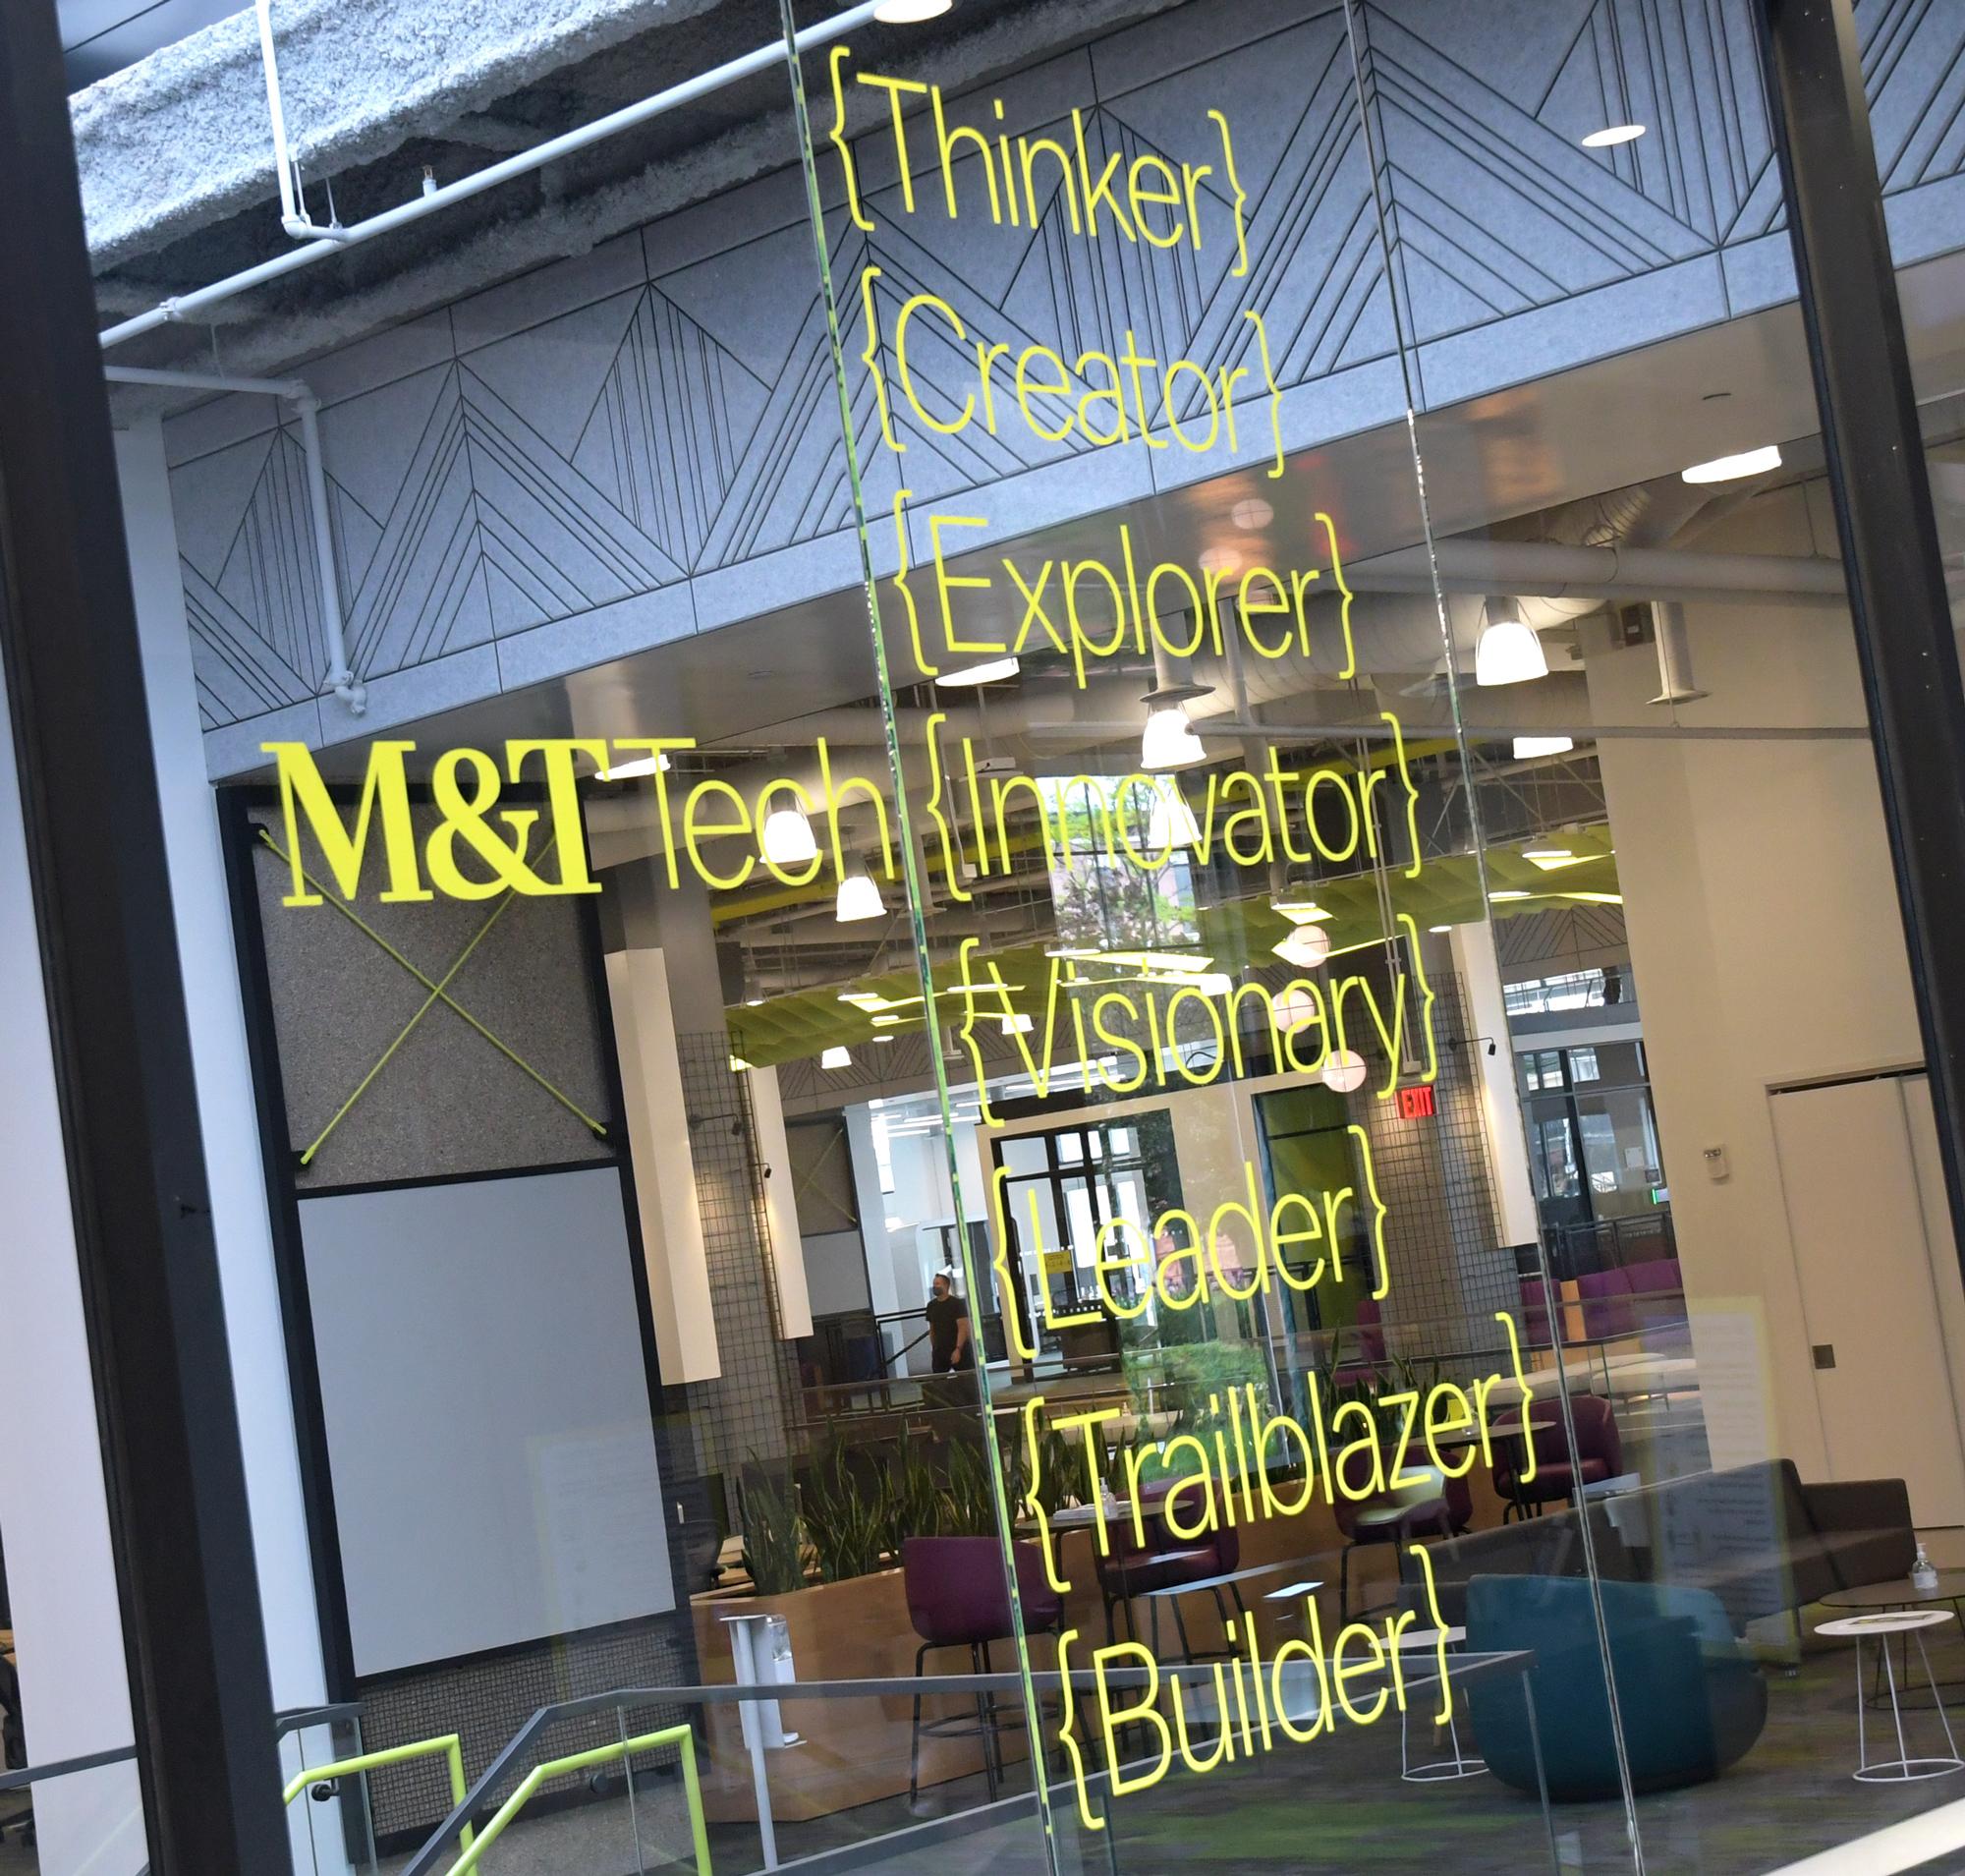 Photo of window adhesive wording using M and T branding